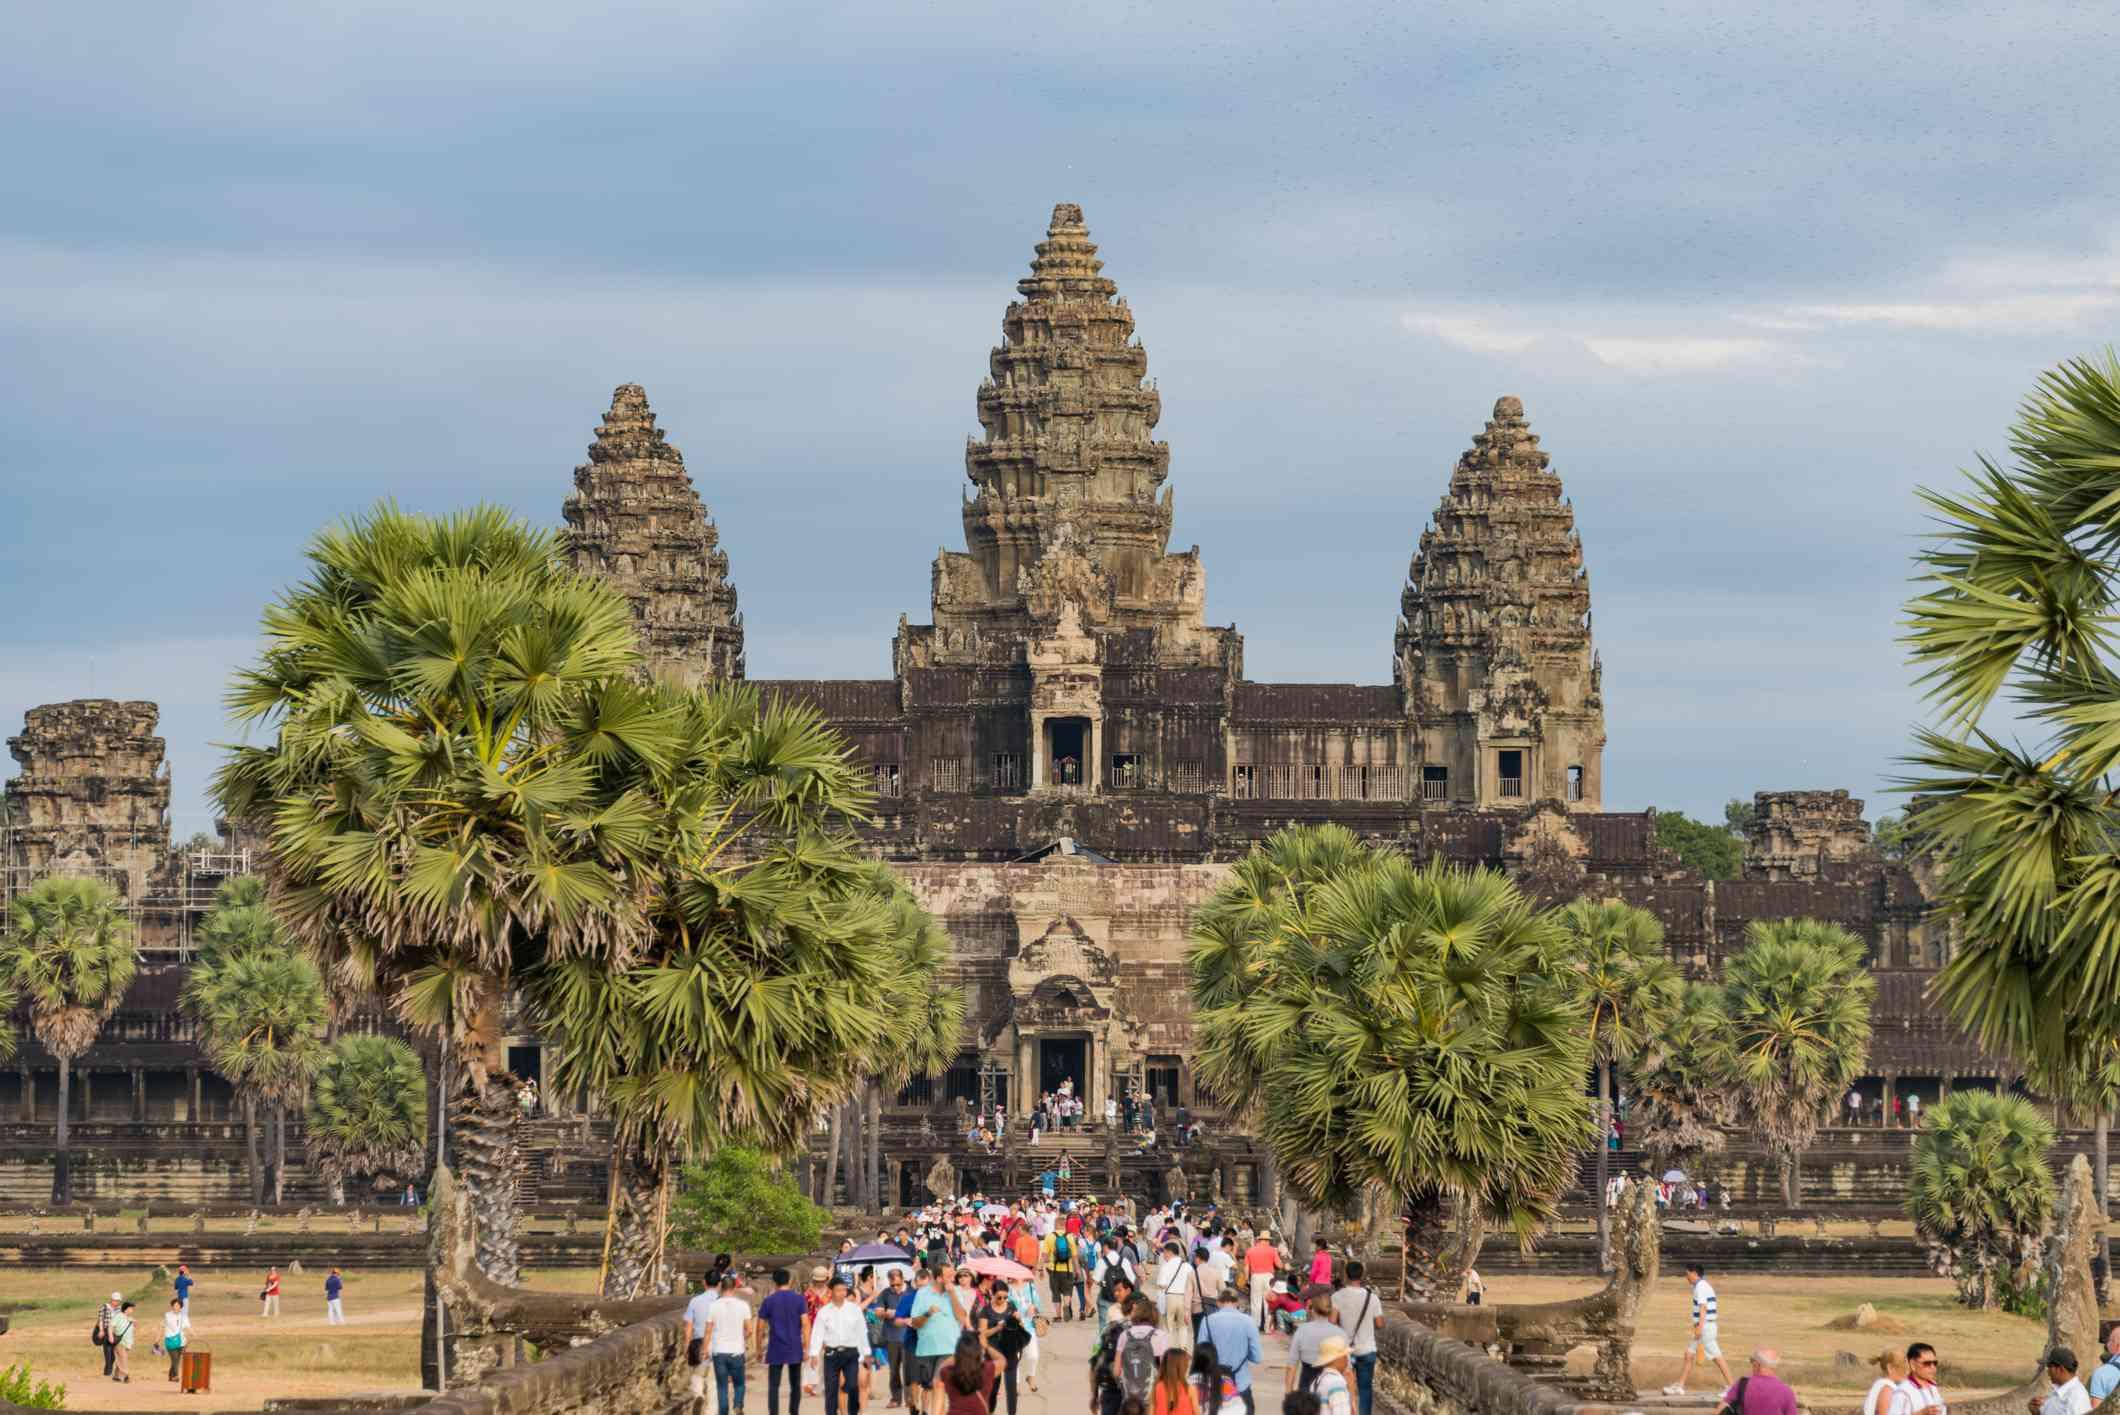 Tourists visit Angkor Wat temple at sunset, Siem Reap, Cambodia